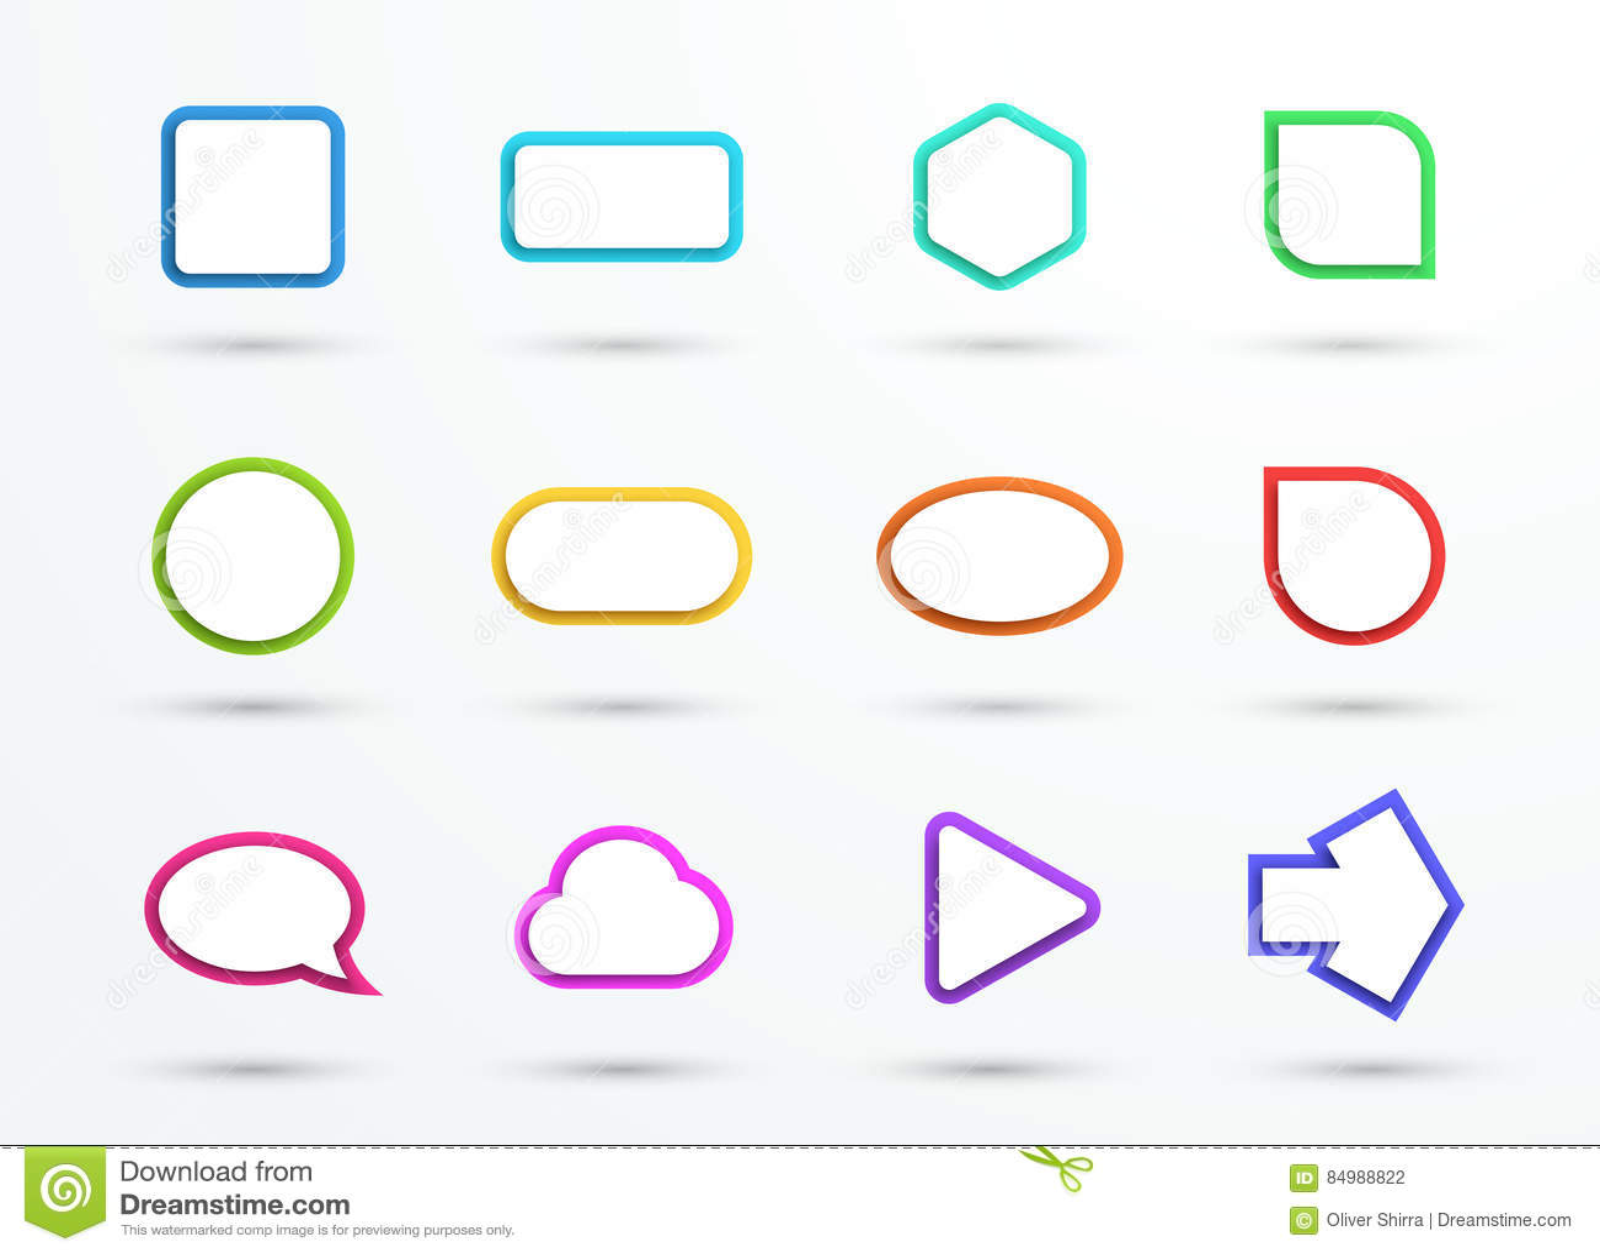 Vector 3d Color Text Box Frames Different Shapes Set Of 12